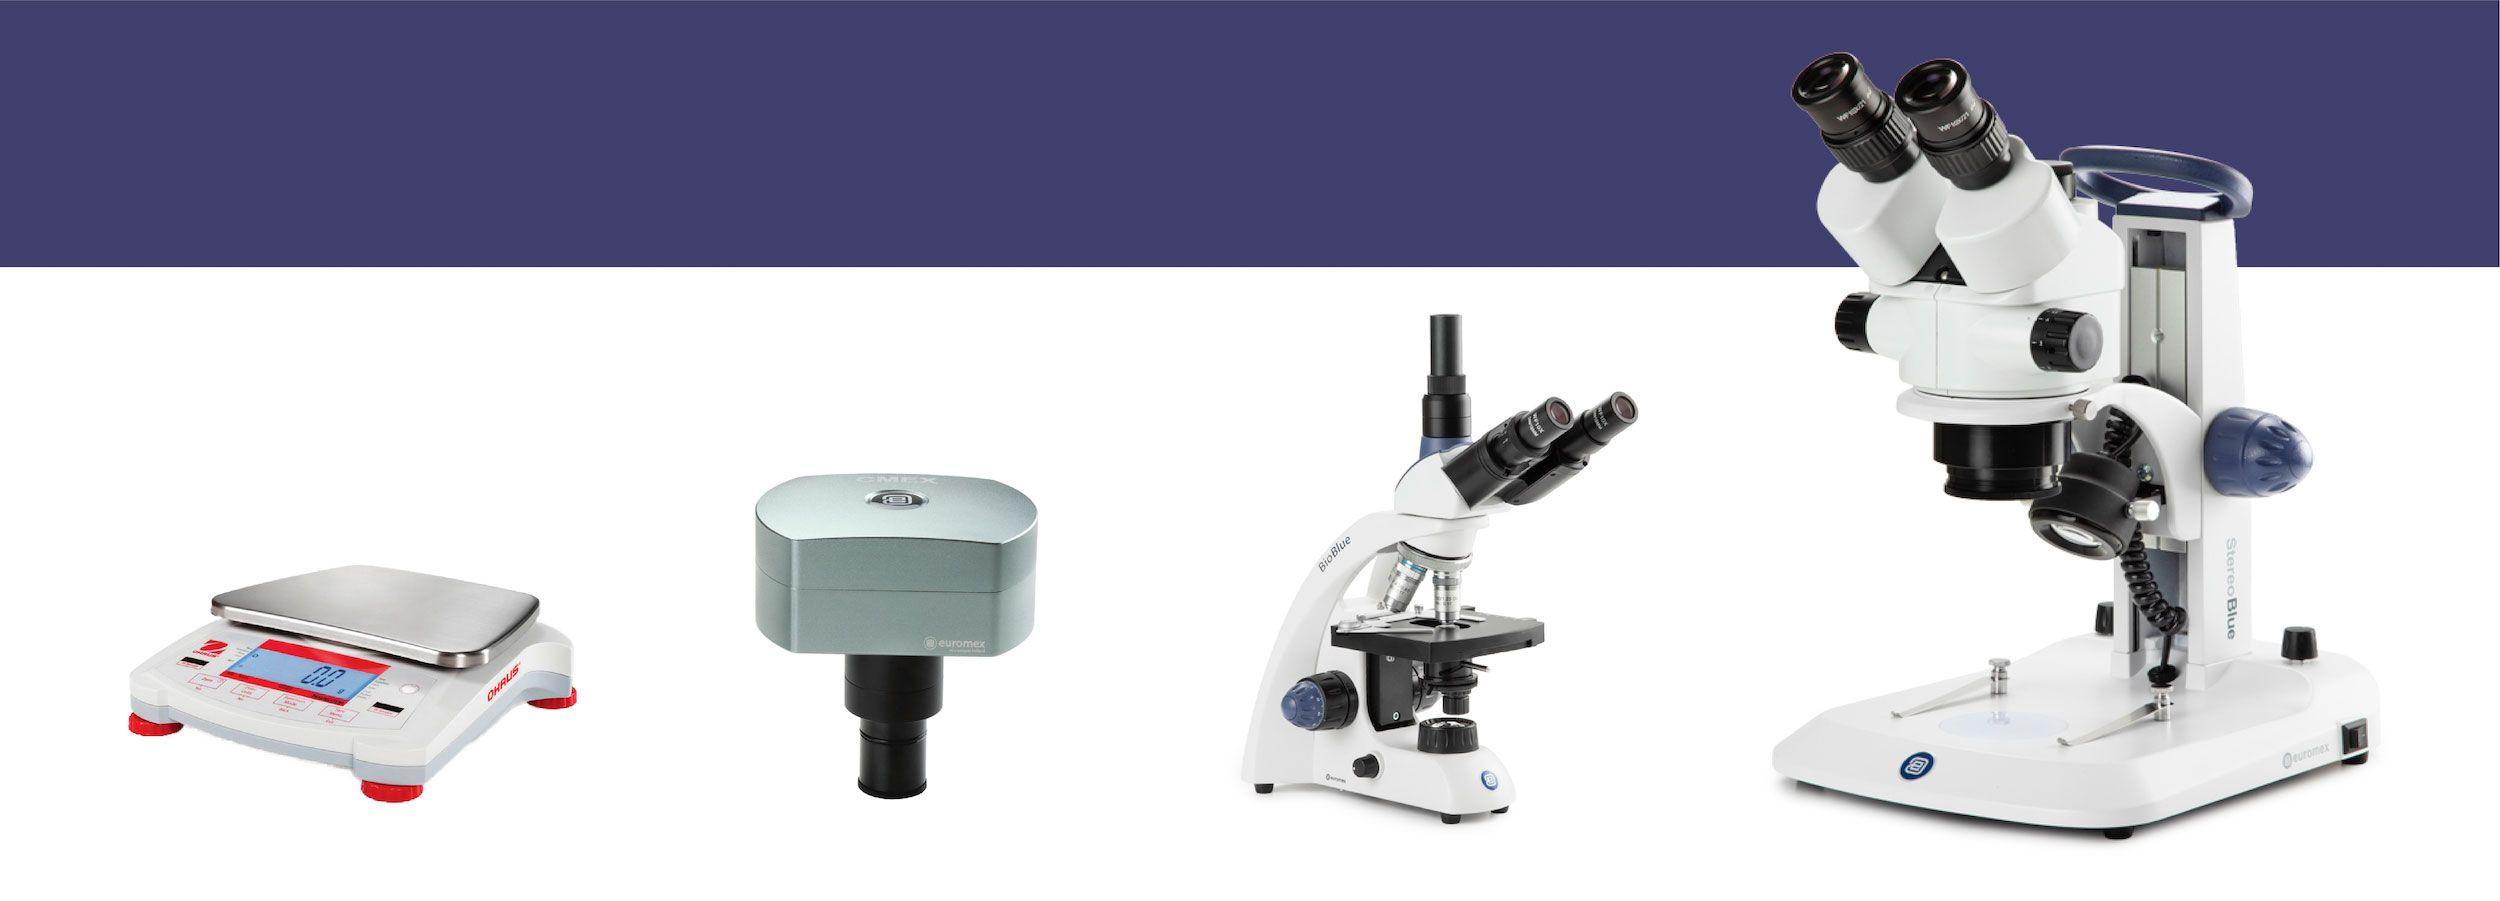 Microscopis i balances